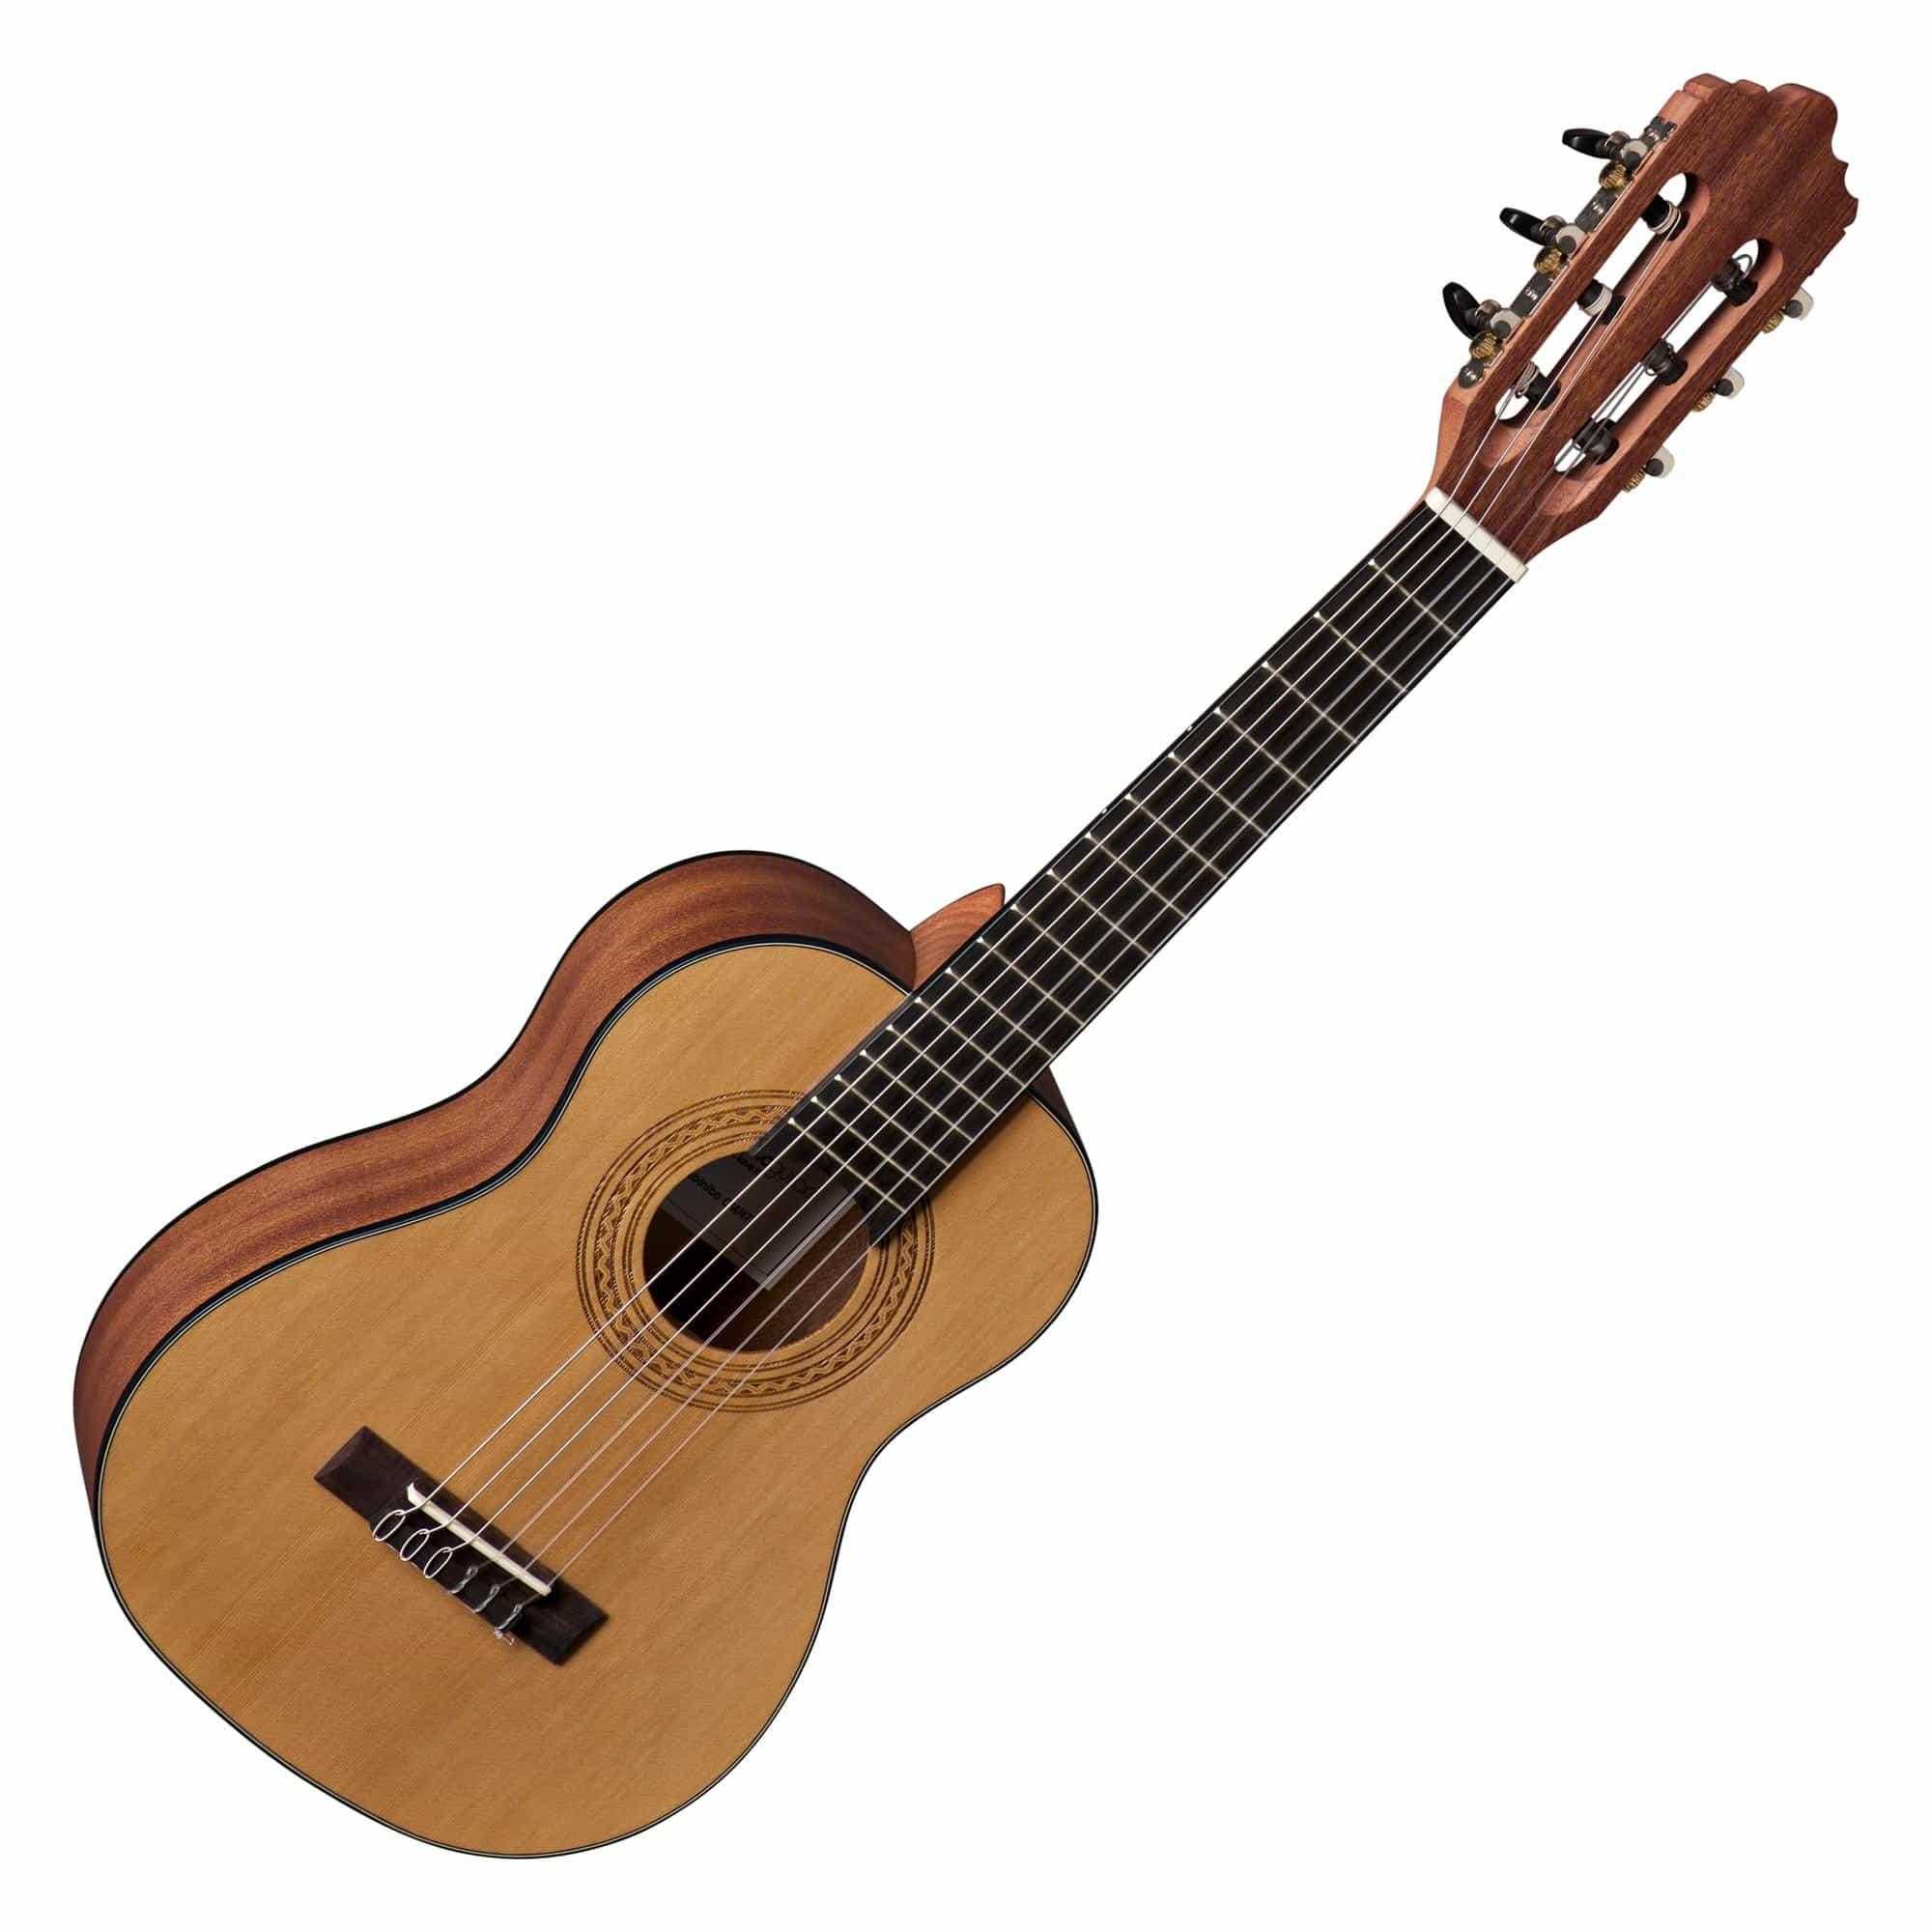 La Mancha Rubinito cm|53 1|2 Konzertgitarre